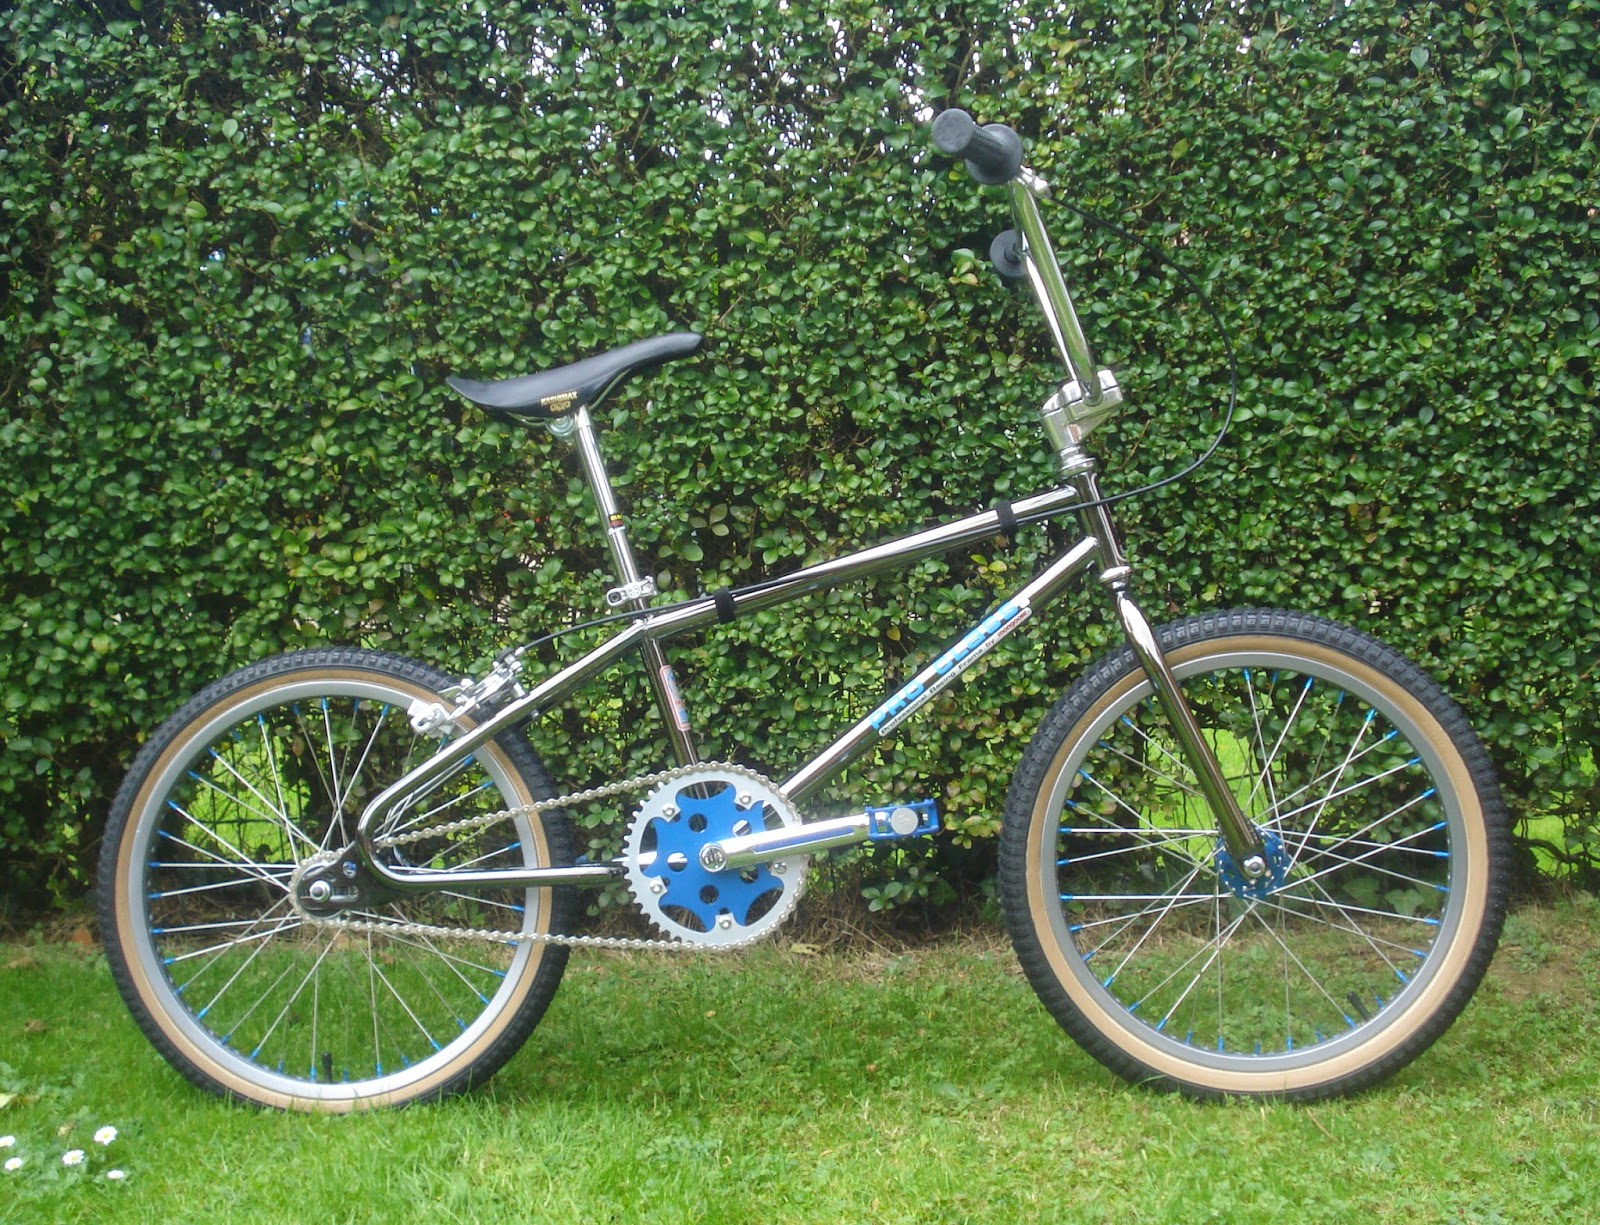 NOS Vintage Old School BMX Seat Clamp